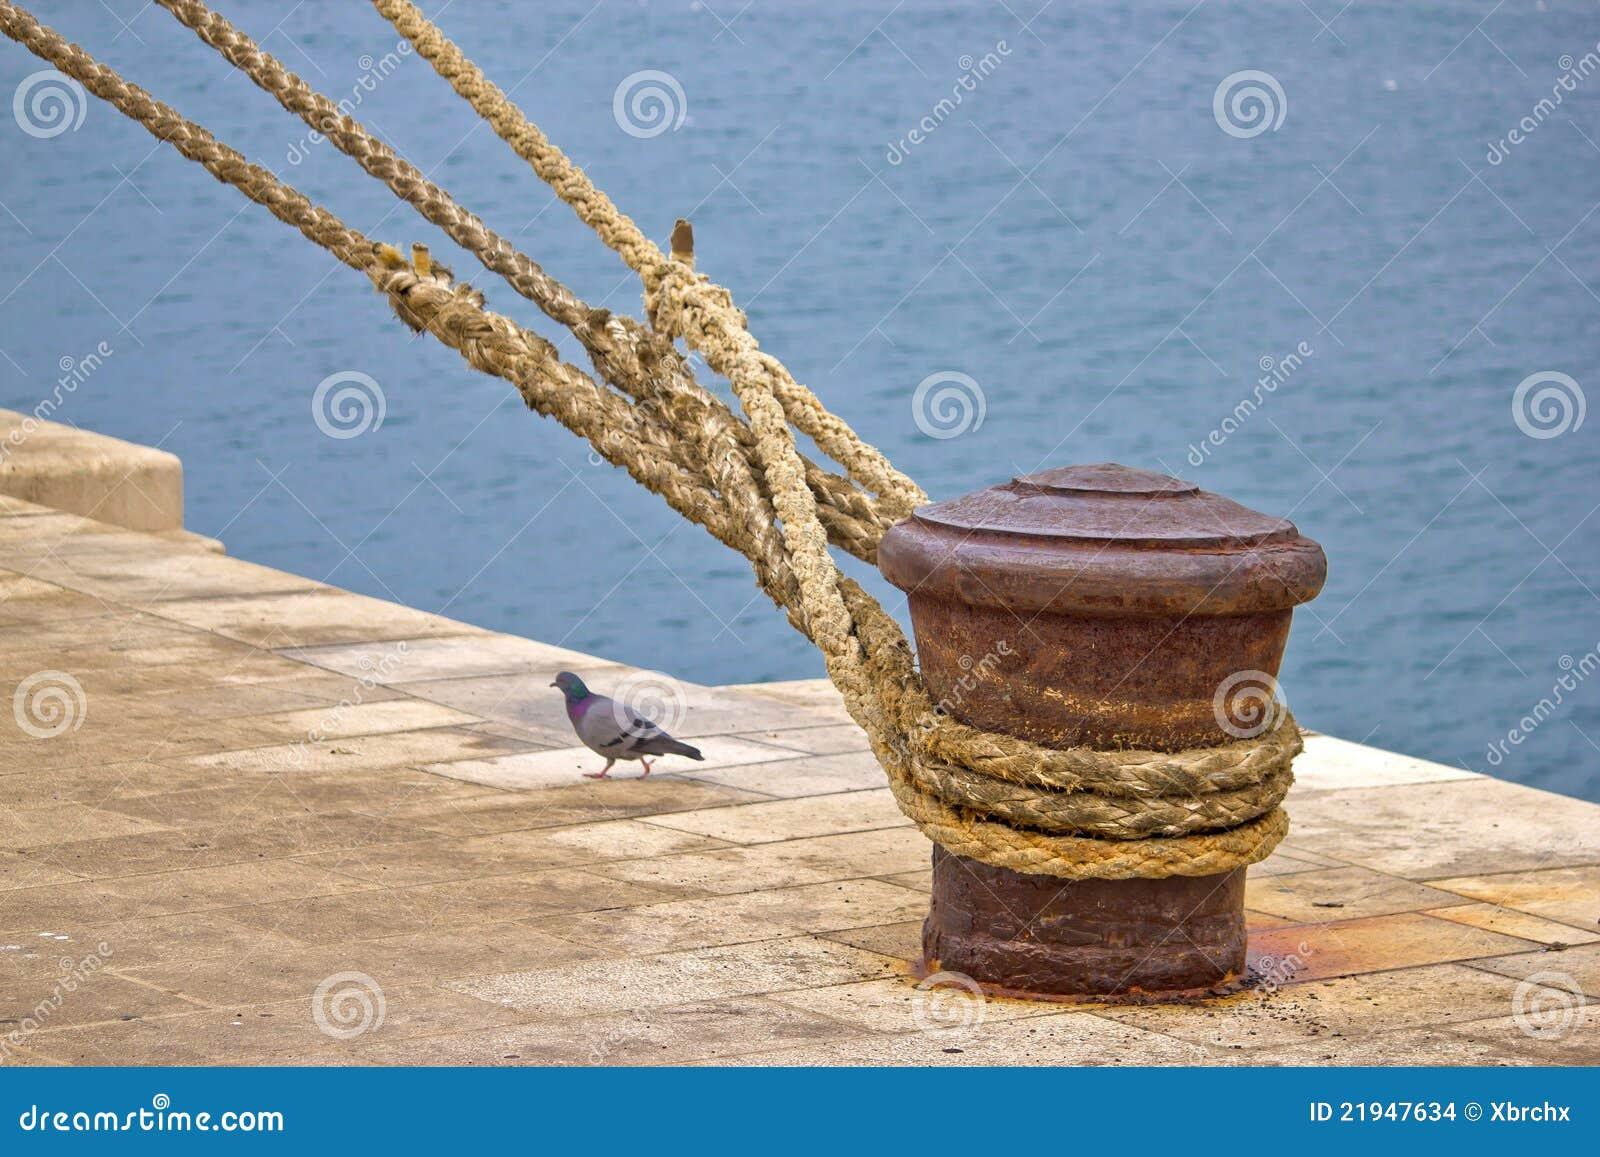 Rusty Mooring Bollard With Ship Ropes Stock Images - Image: 21947634